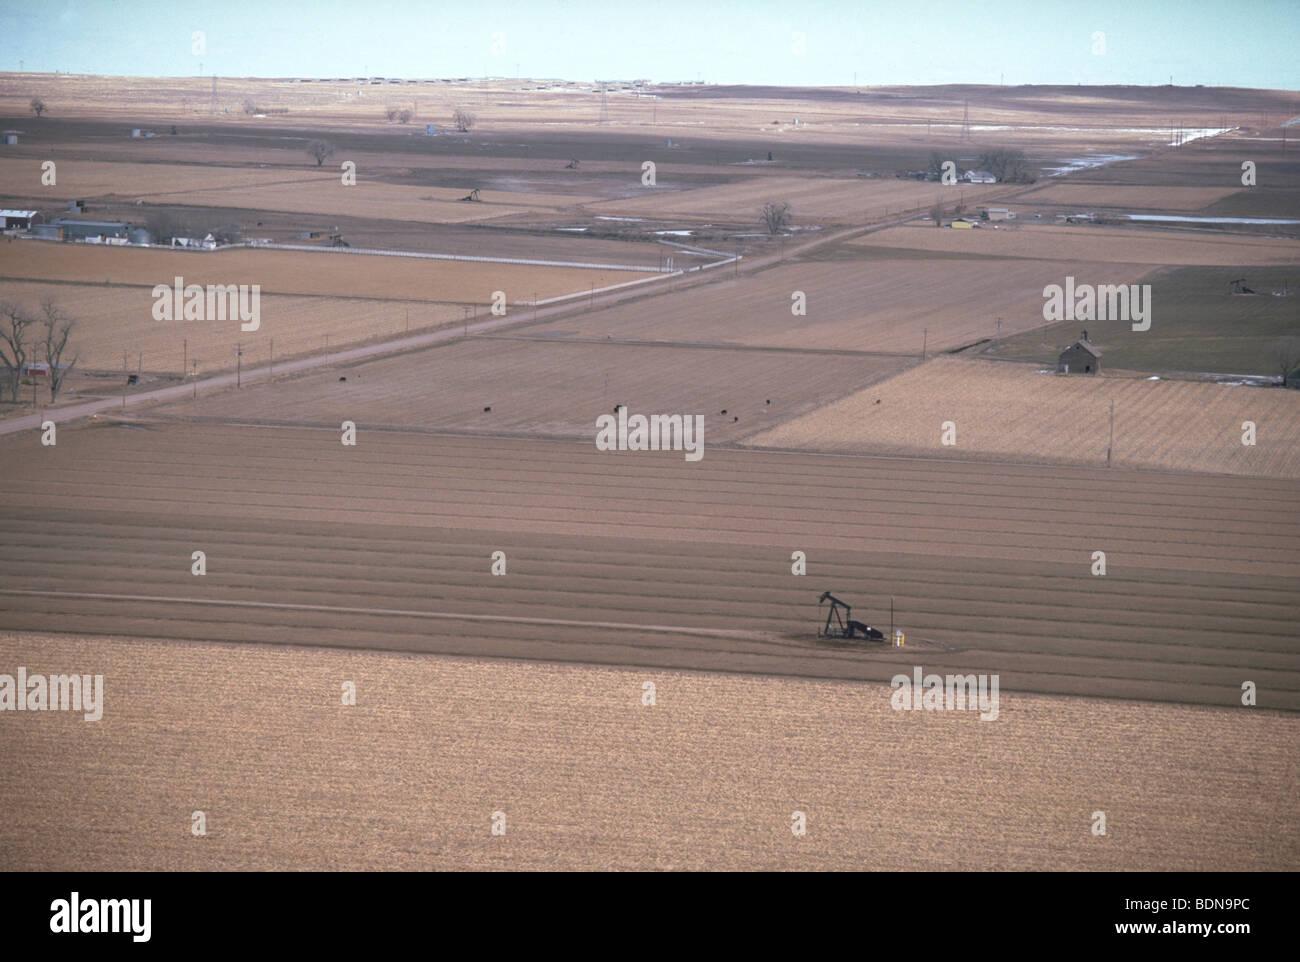 Oil pumper in agricultural field, rural Colorado - Stock Image